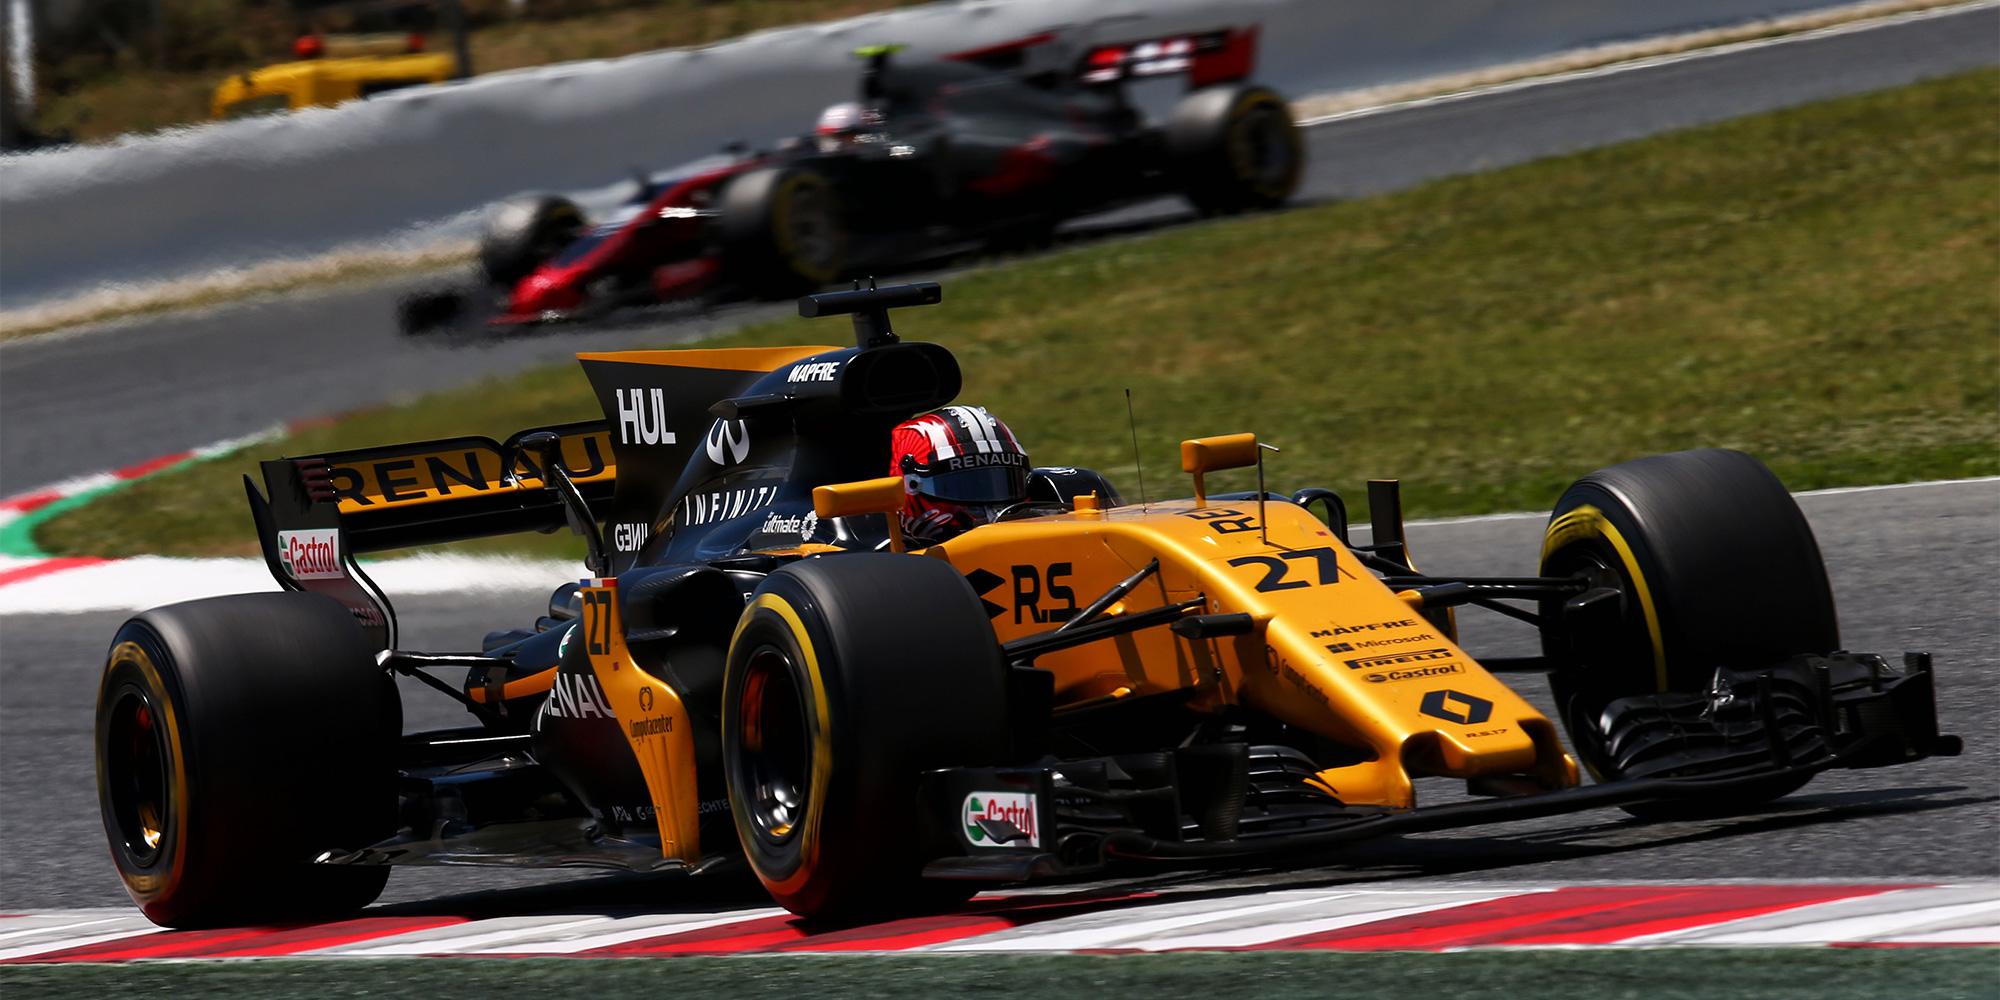 Formel 1 in Spanien